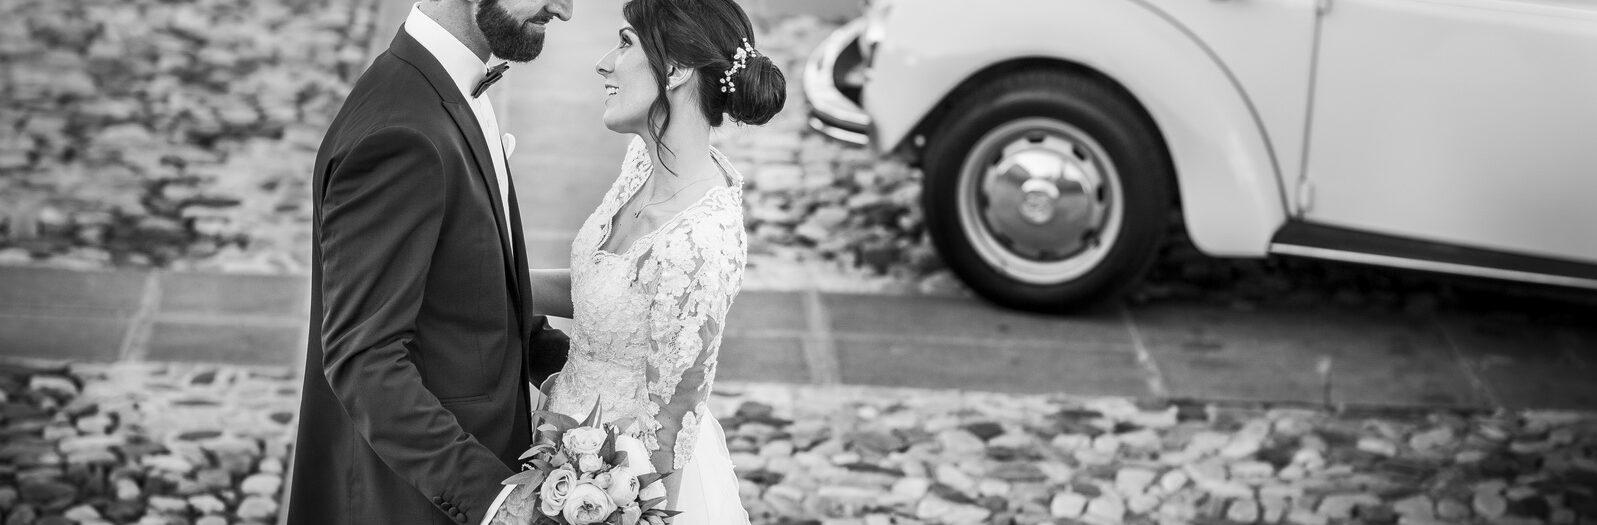 Matrimonio Santarcangelo